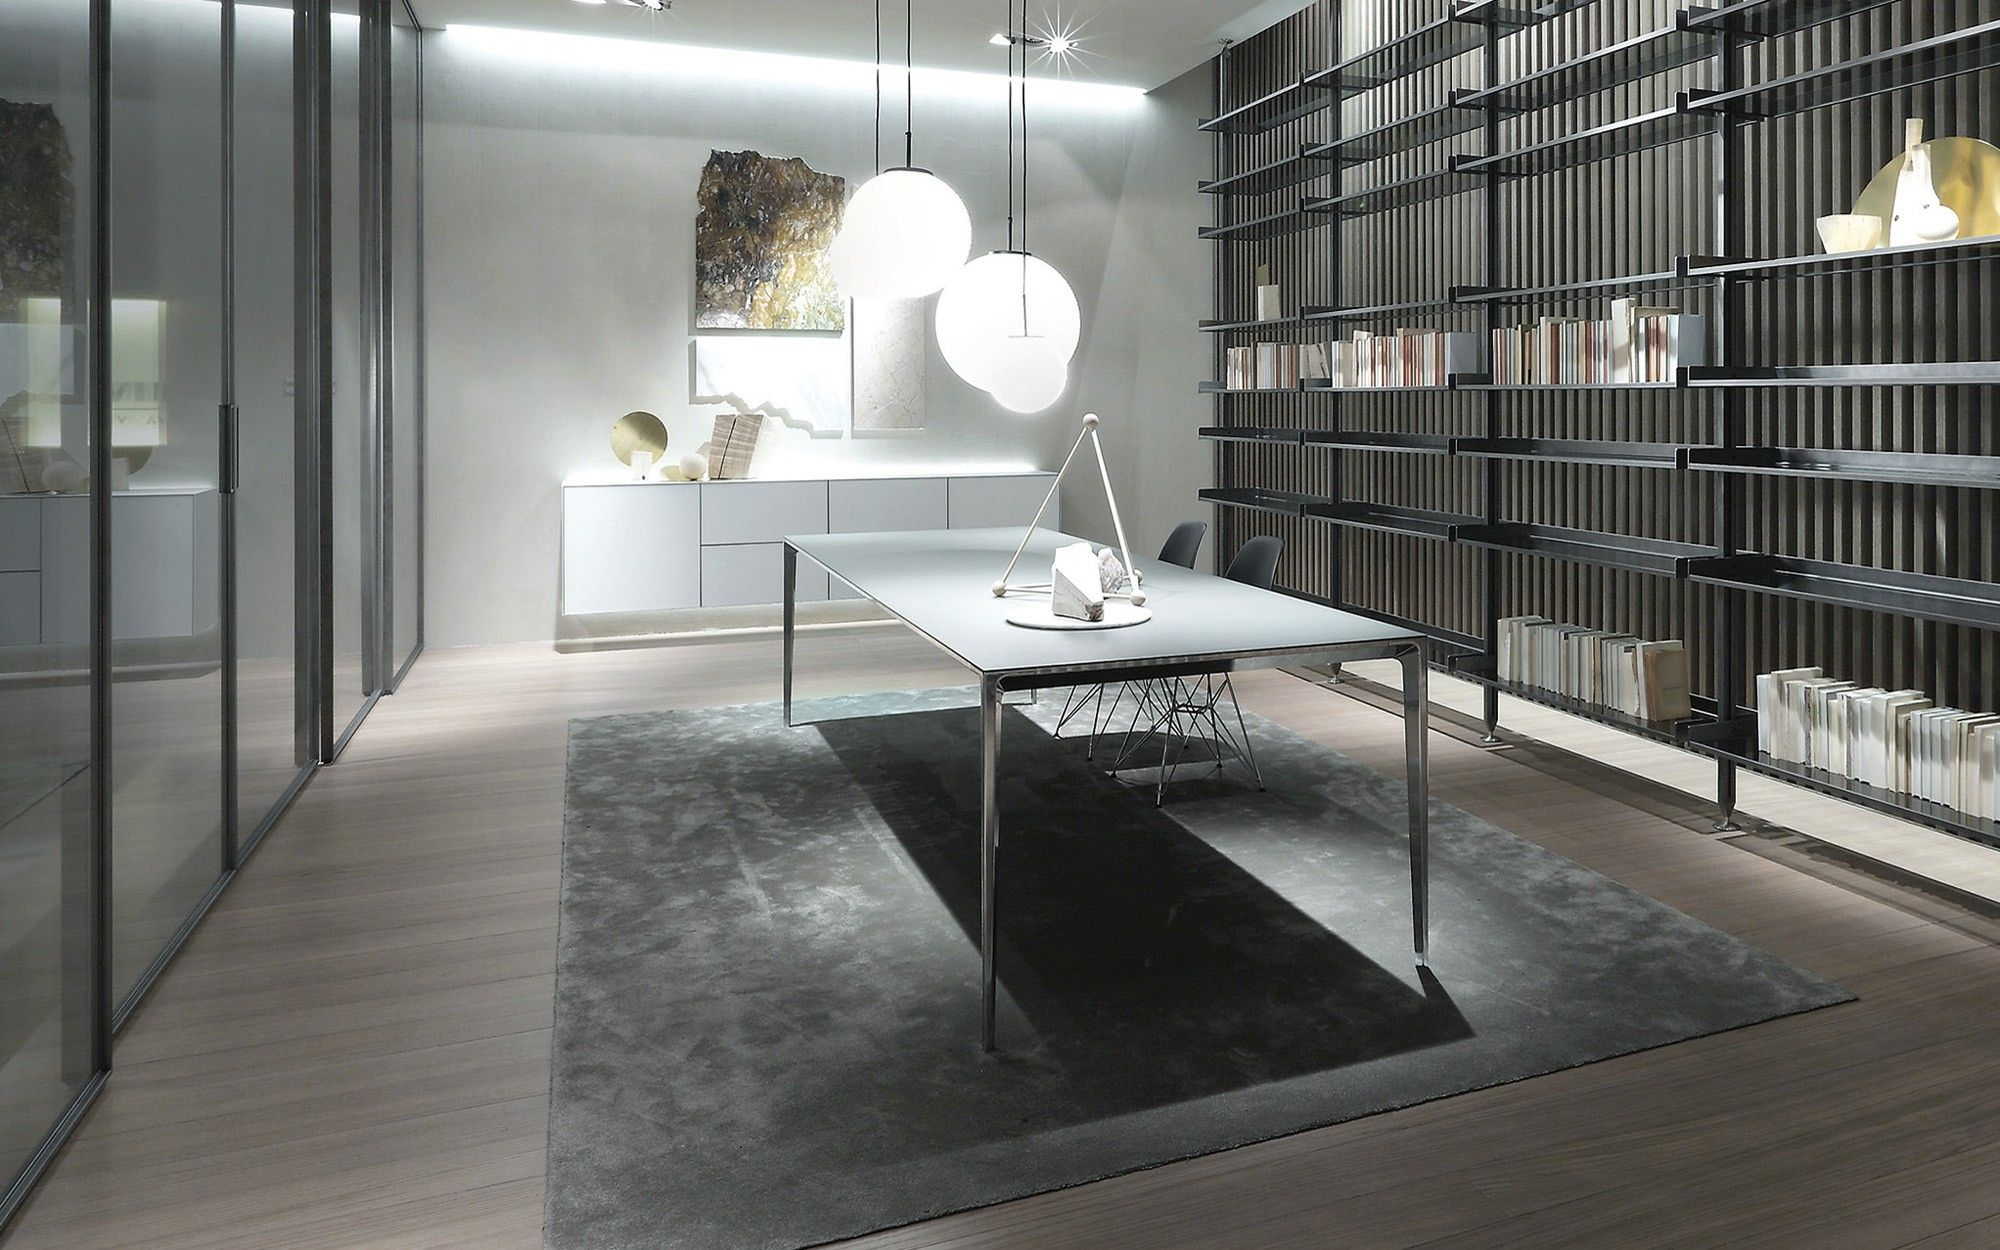 Tavolo Rimadesio ~ The long island table by rimadesio from pure interiors interior